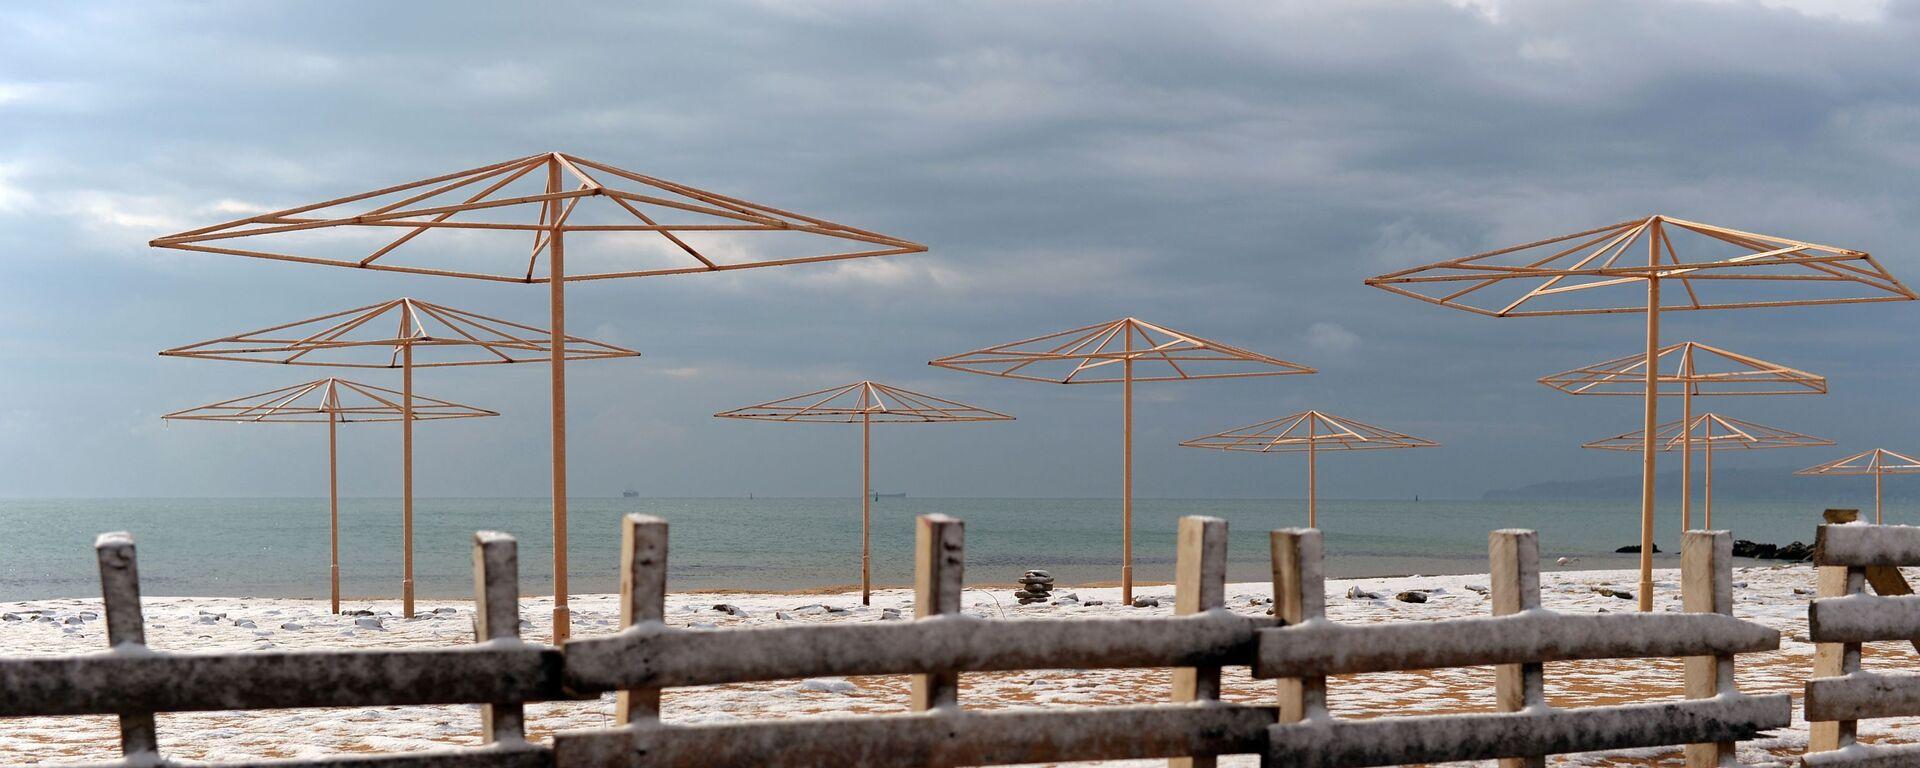 Una spiaggia coperta dalla neve - Sputnik Italia, 1920, 29.07.2021